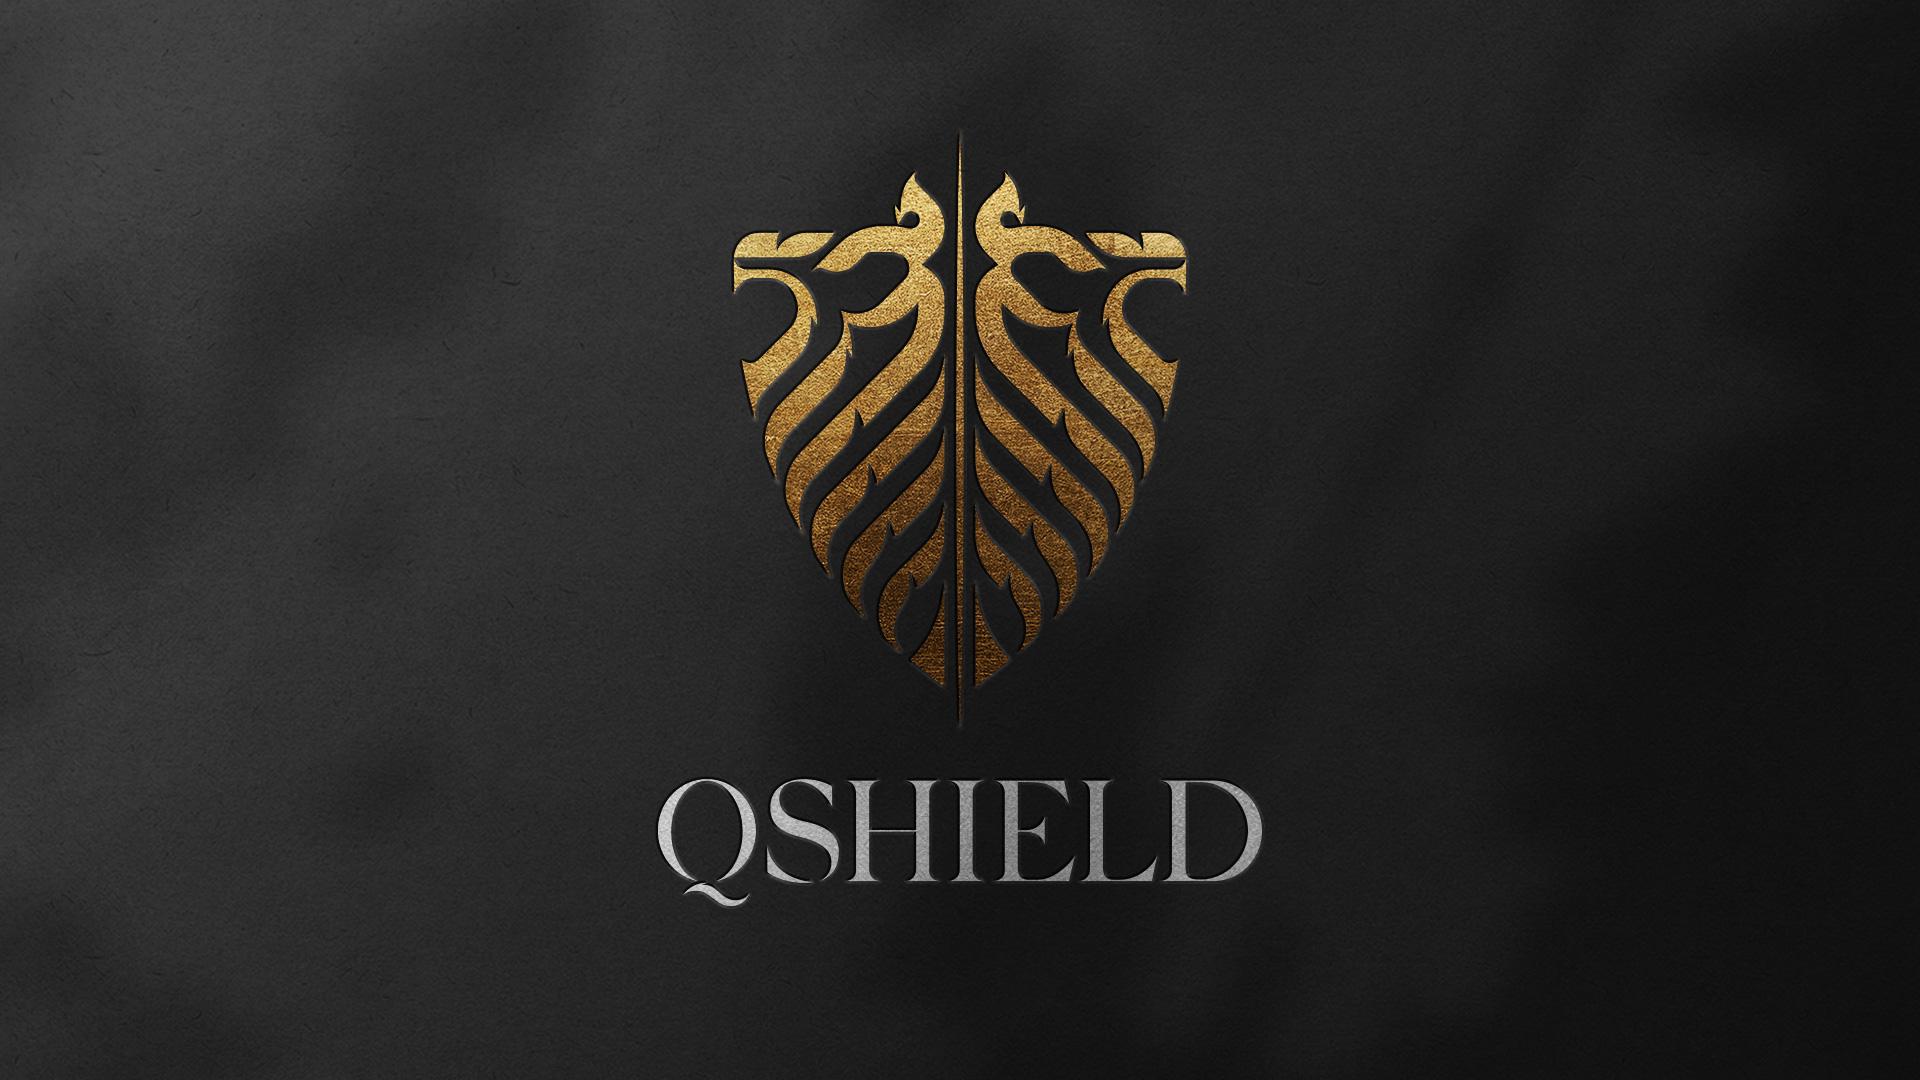 Qshield